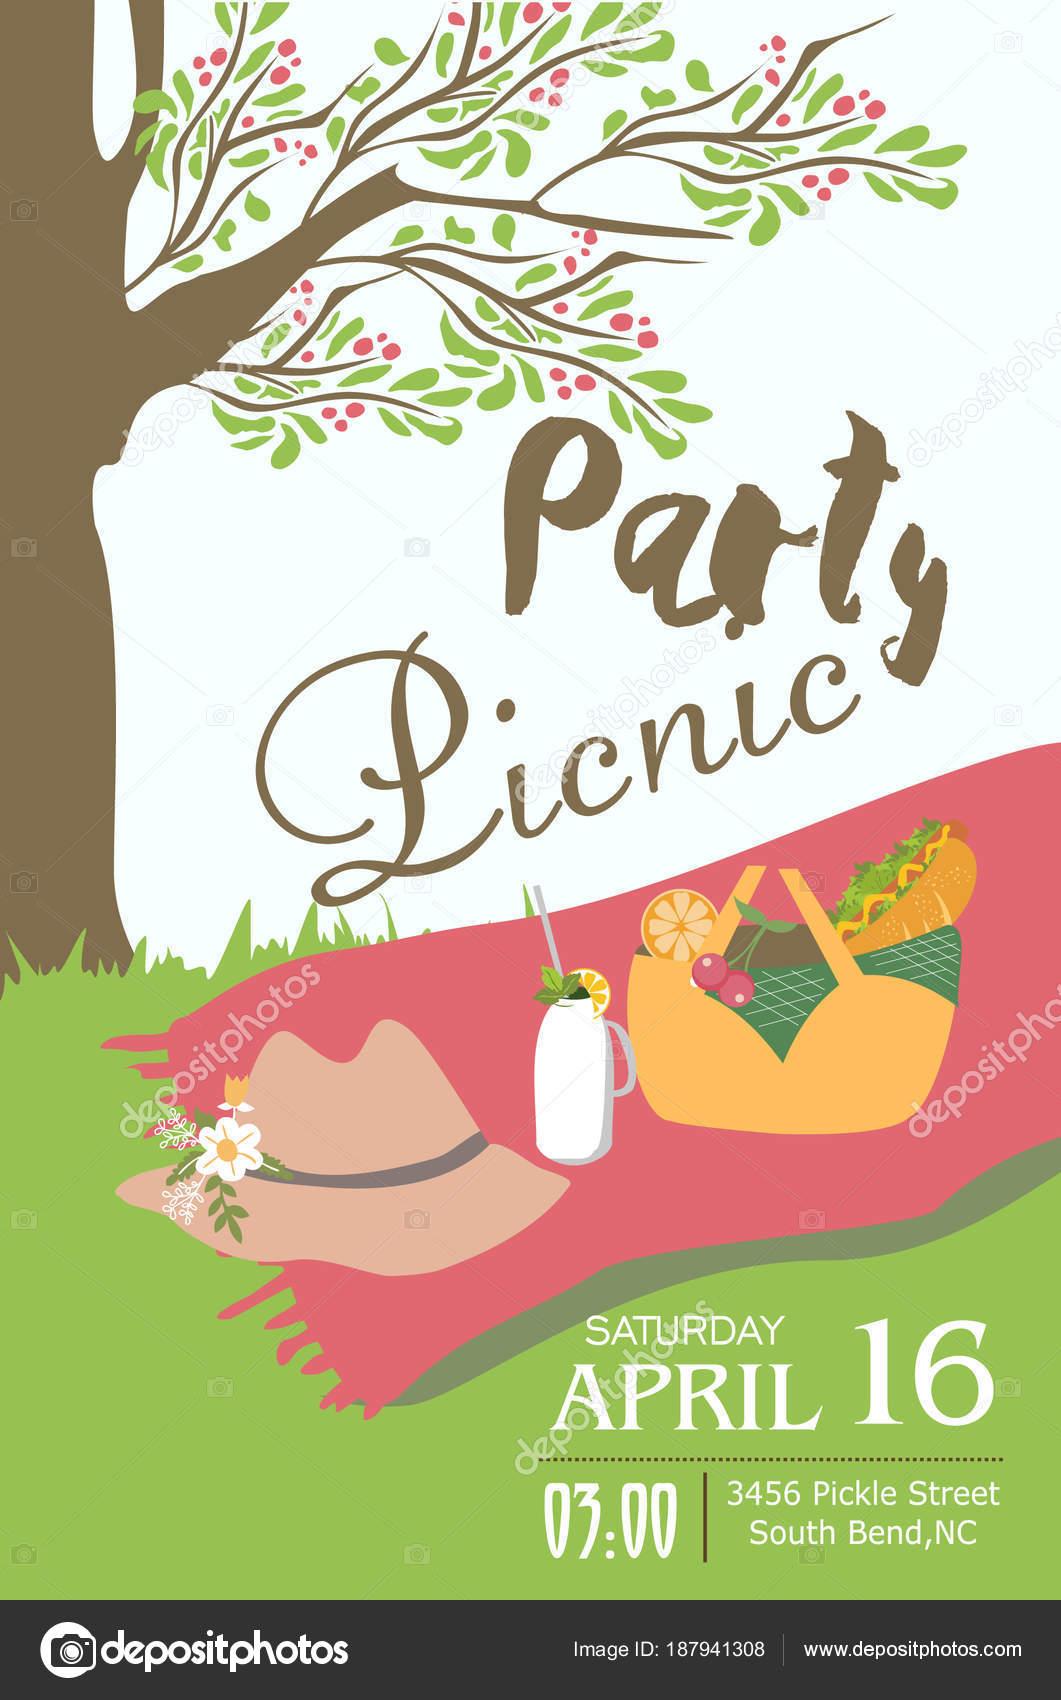 Picnic party invitation card stock vector sweetcheeks 187941308 picnic party invitation card stock vector stopboris Choice Image